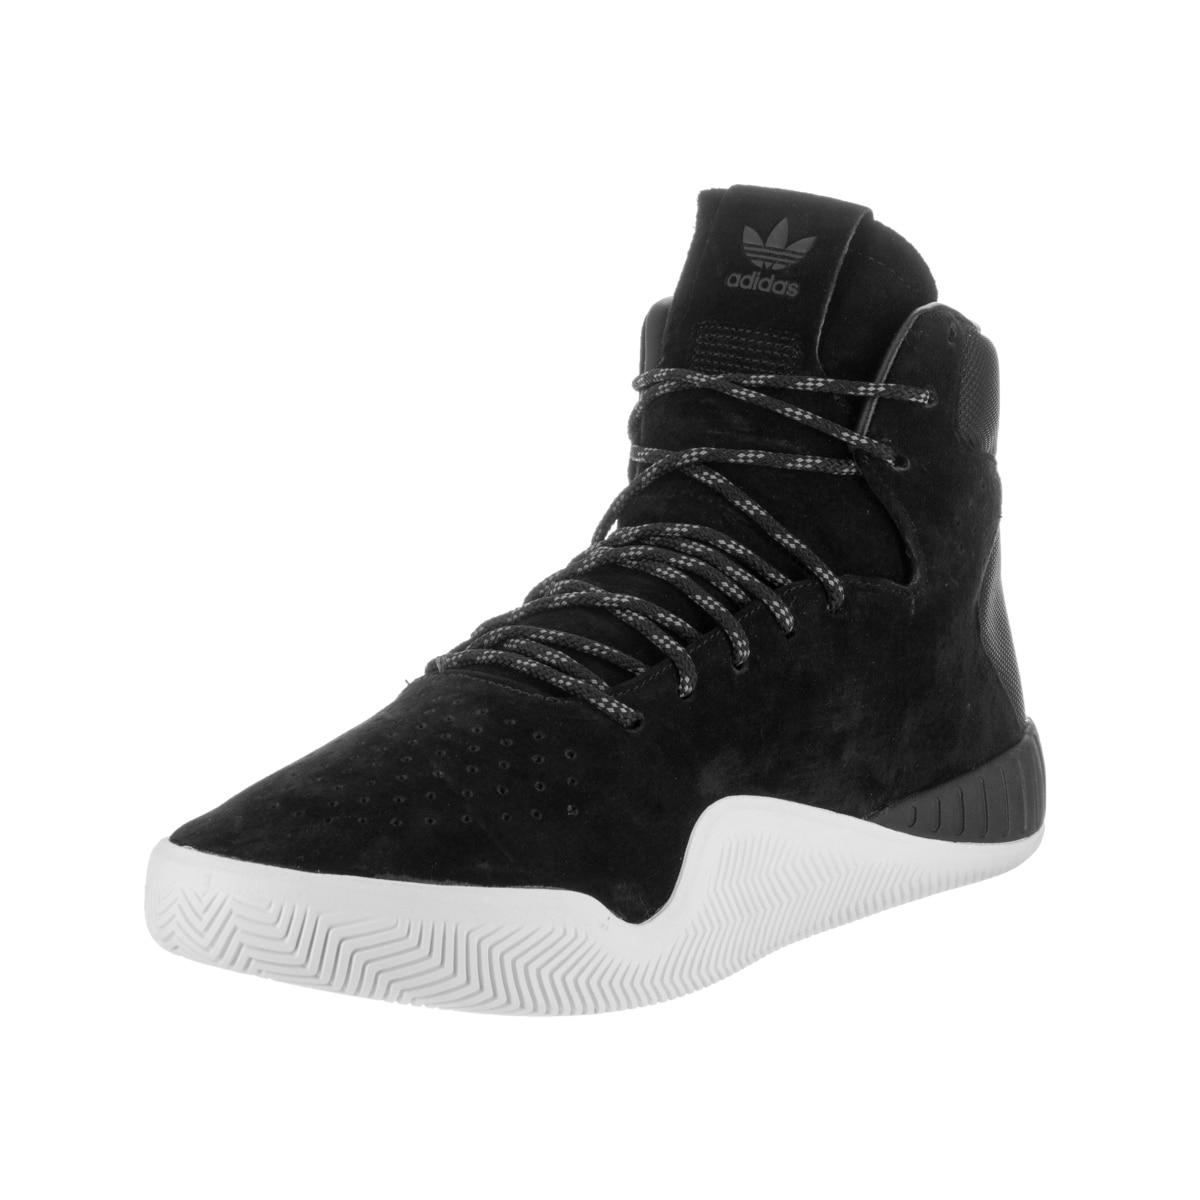 Adidas Men's Tubular Instinct Black Suede Casual Shoes (8)